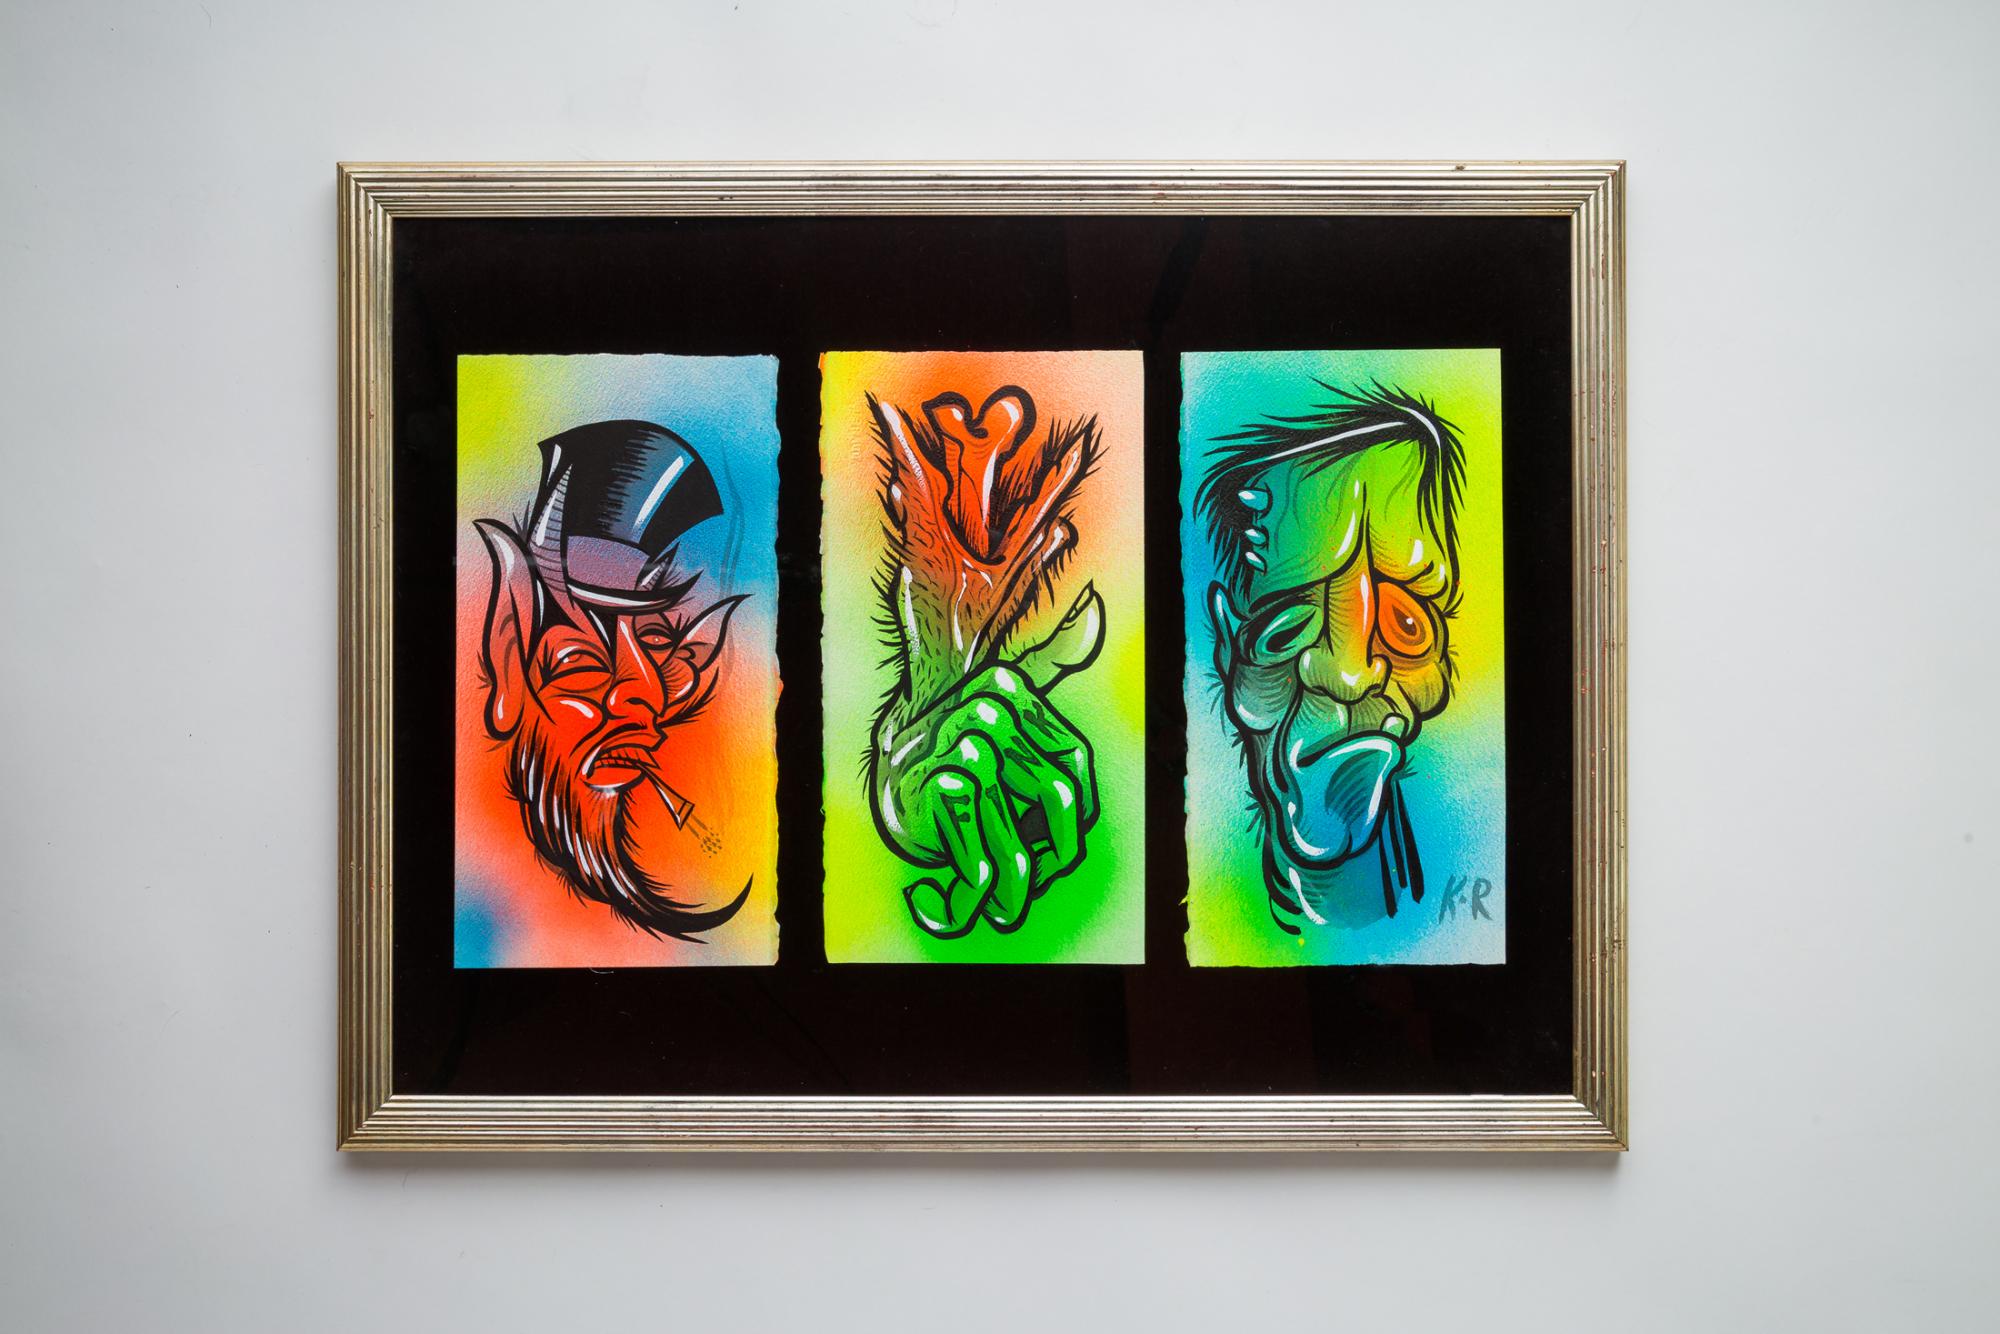 KINGRAT TATTOO 作品 | LAVA gallery | Tattoo artist: Yuji Anai | キングラット | ラバギャラリー | タトゥーアート | 福岡県北九州市 | art_work_3-1